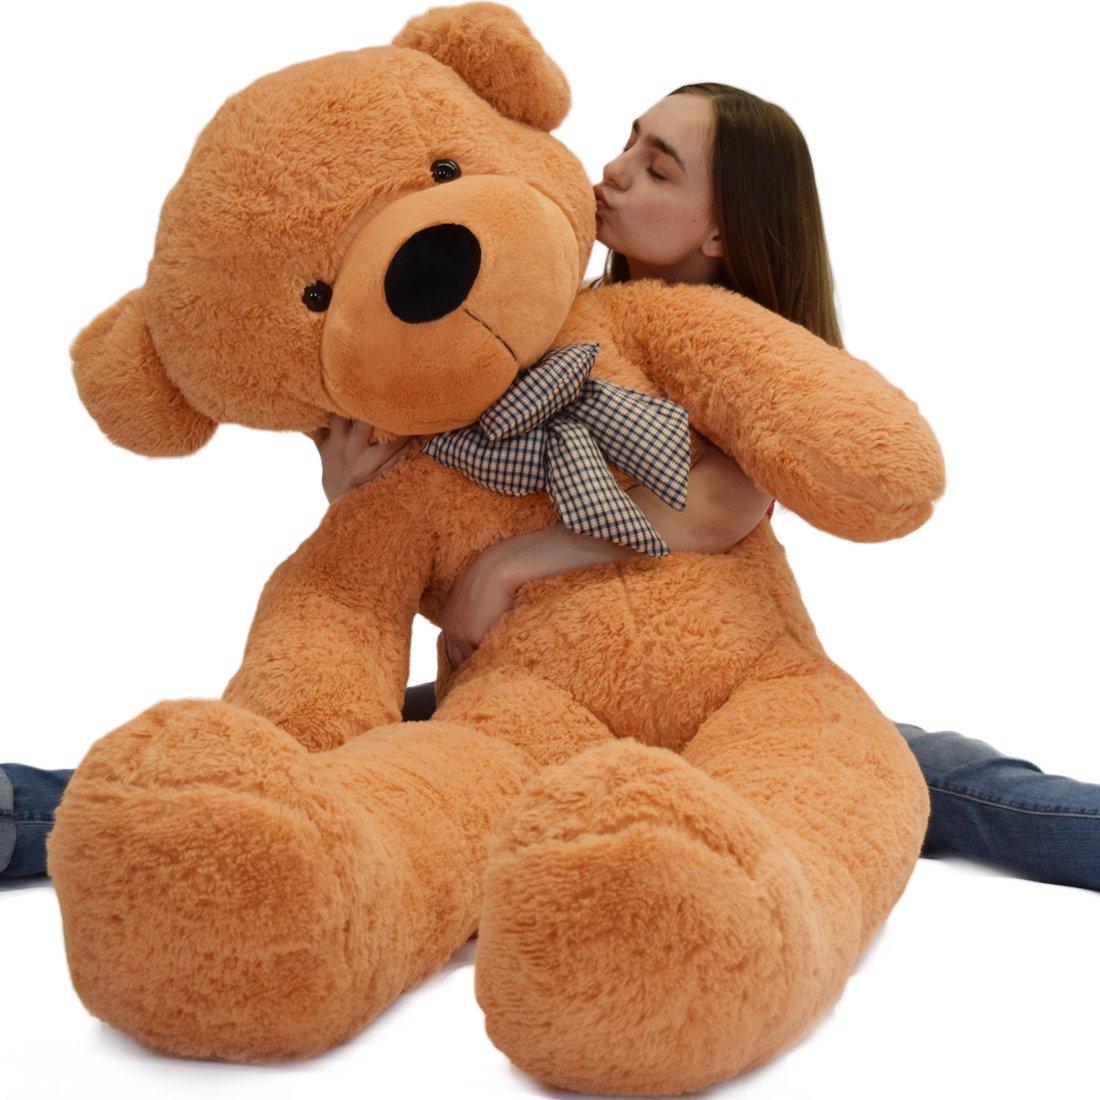 VERCART Giant Huge Teddy Bear Cuddly Stuffed Animals Plush Bear Toy Doll 6.5 Foot 79 inch Light Brown by VERCART